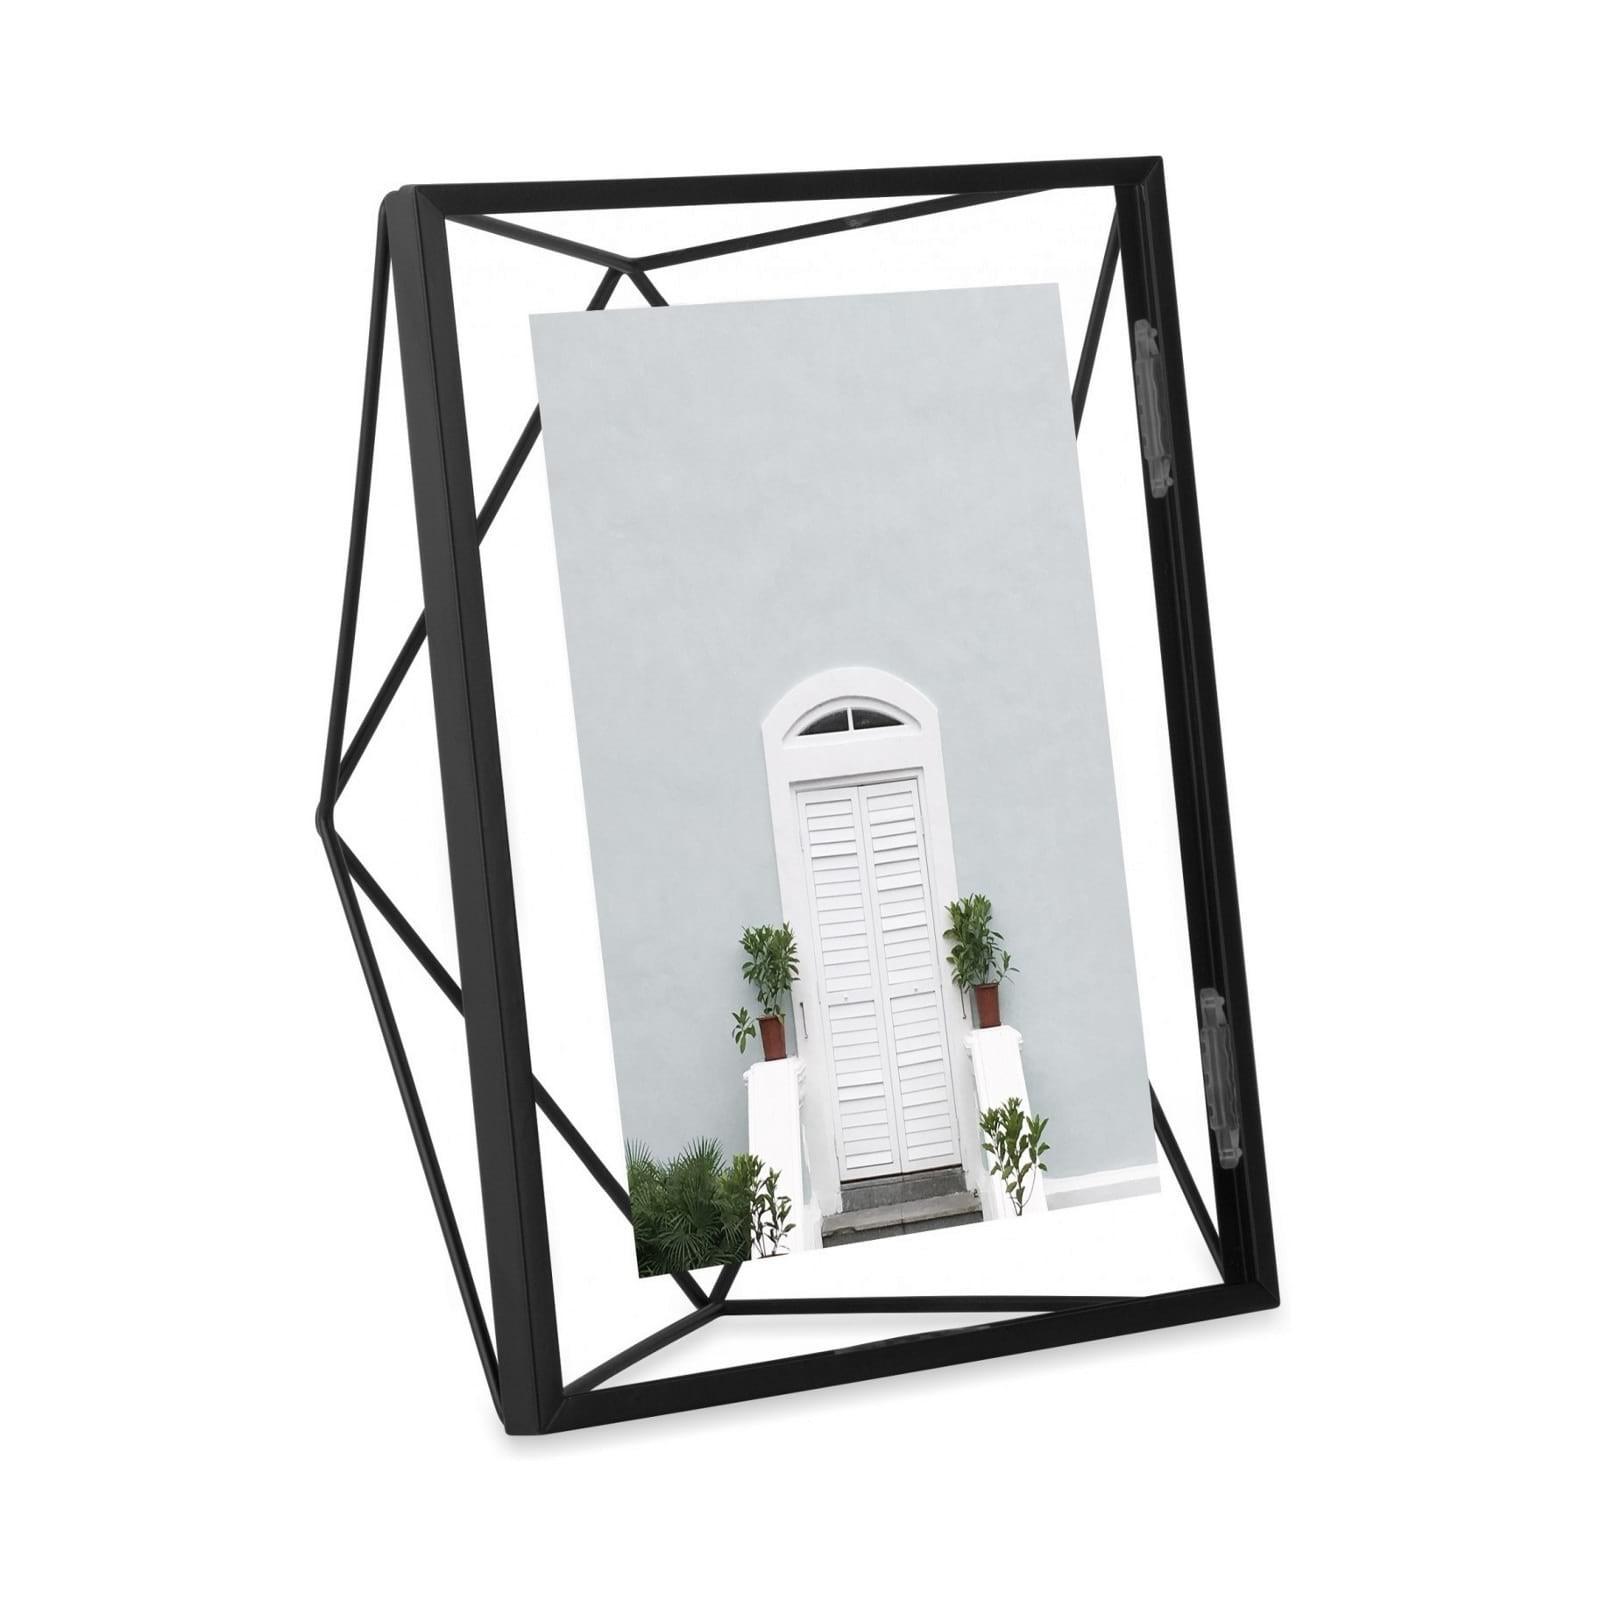 Prisma Photo Display 13 x 18 cm (Black) - Umbra